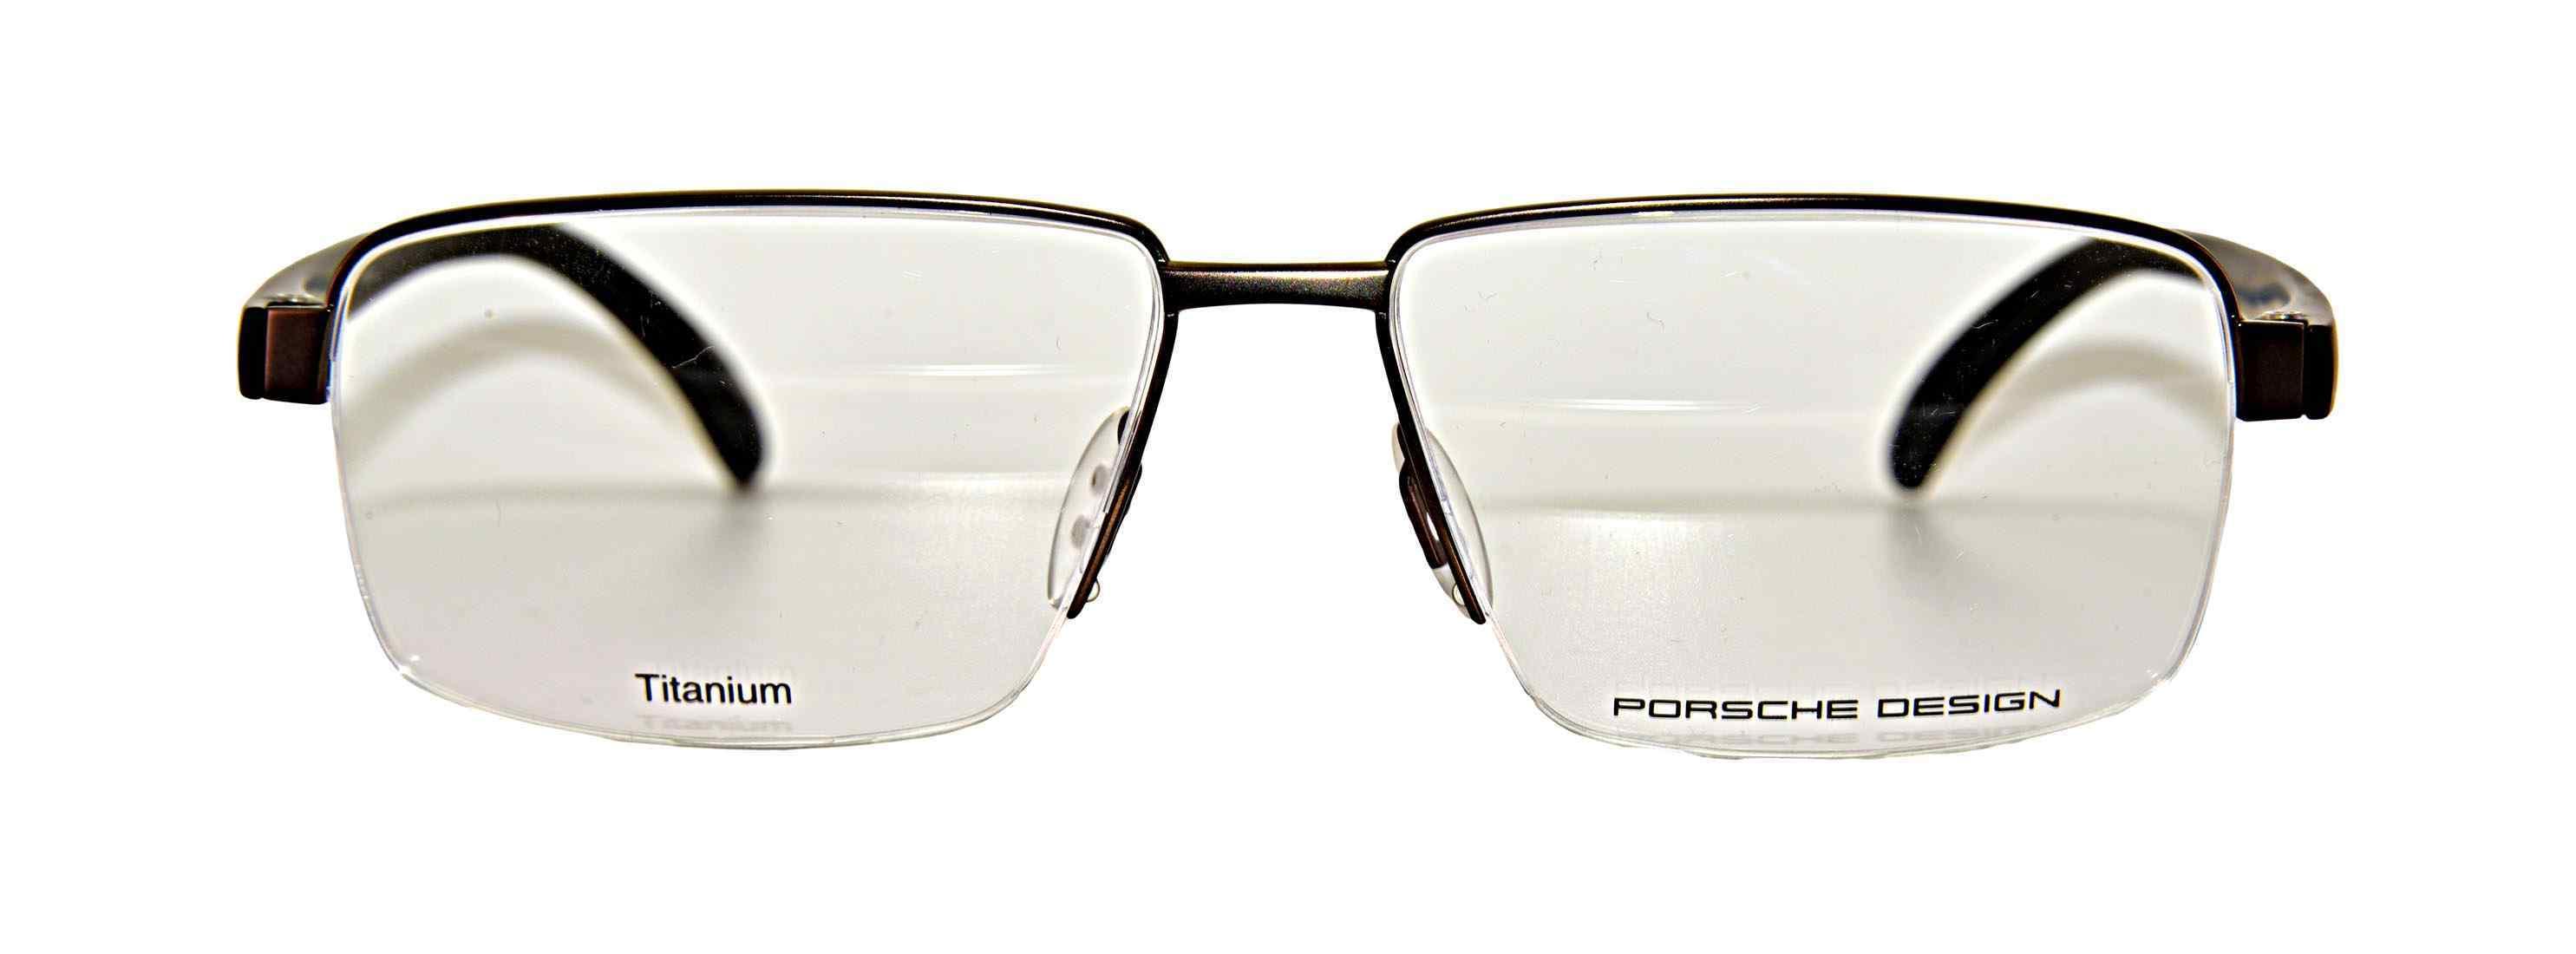 Porsche Design P 8272 C 01 2970x1100